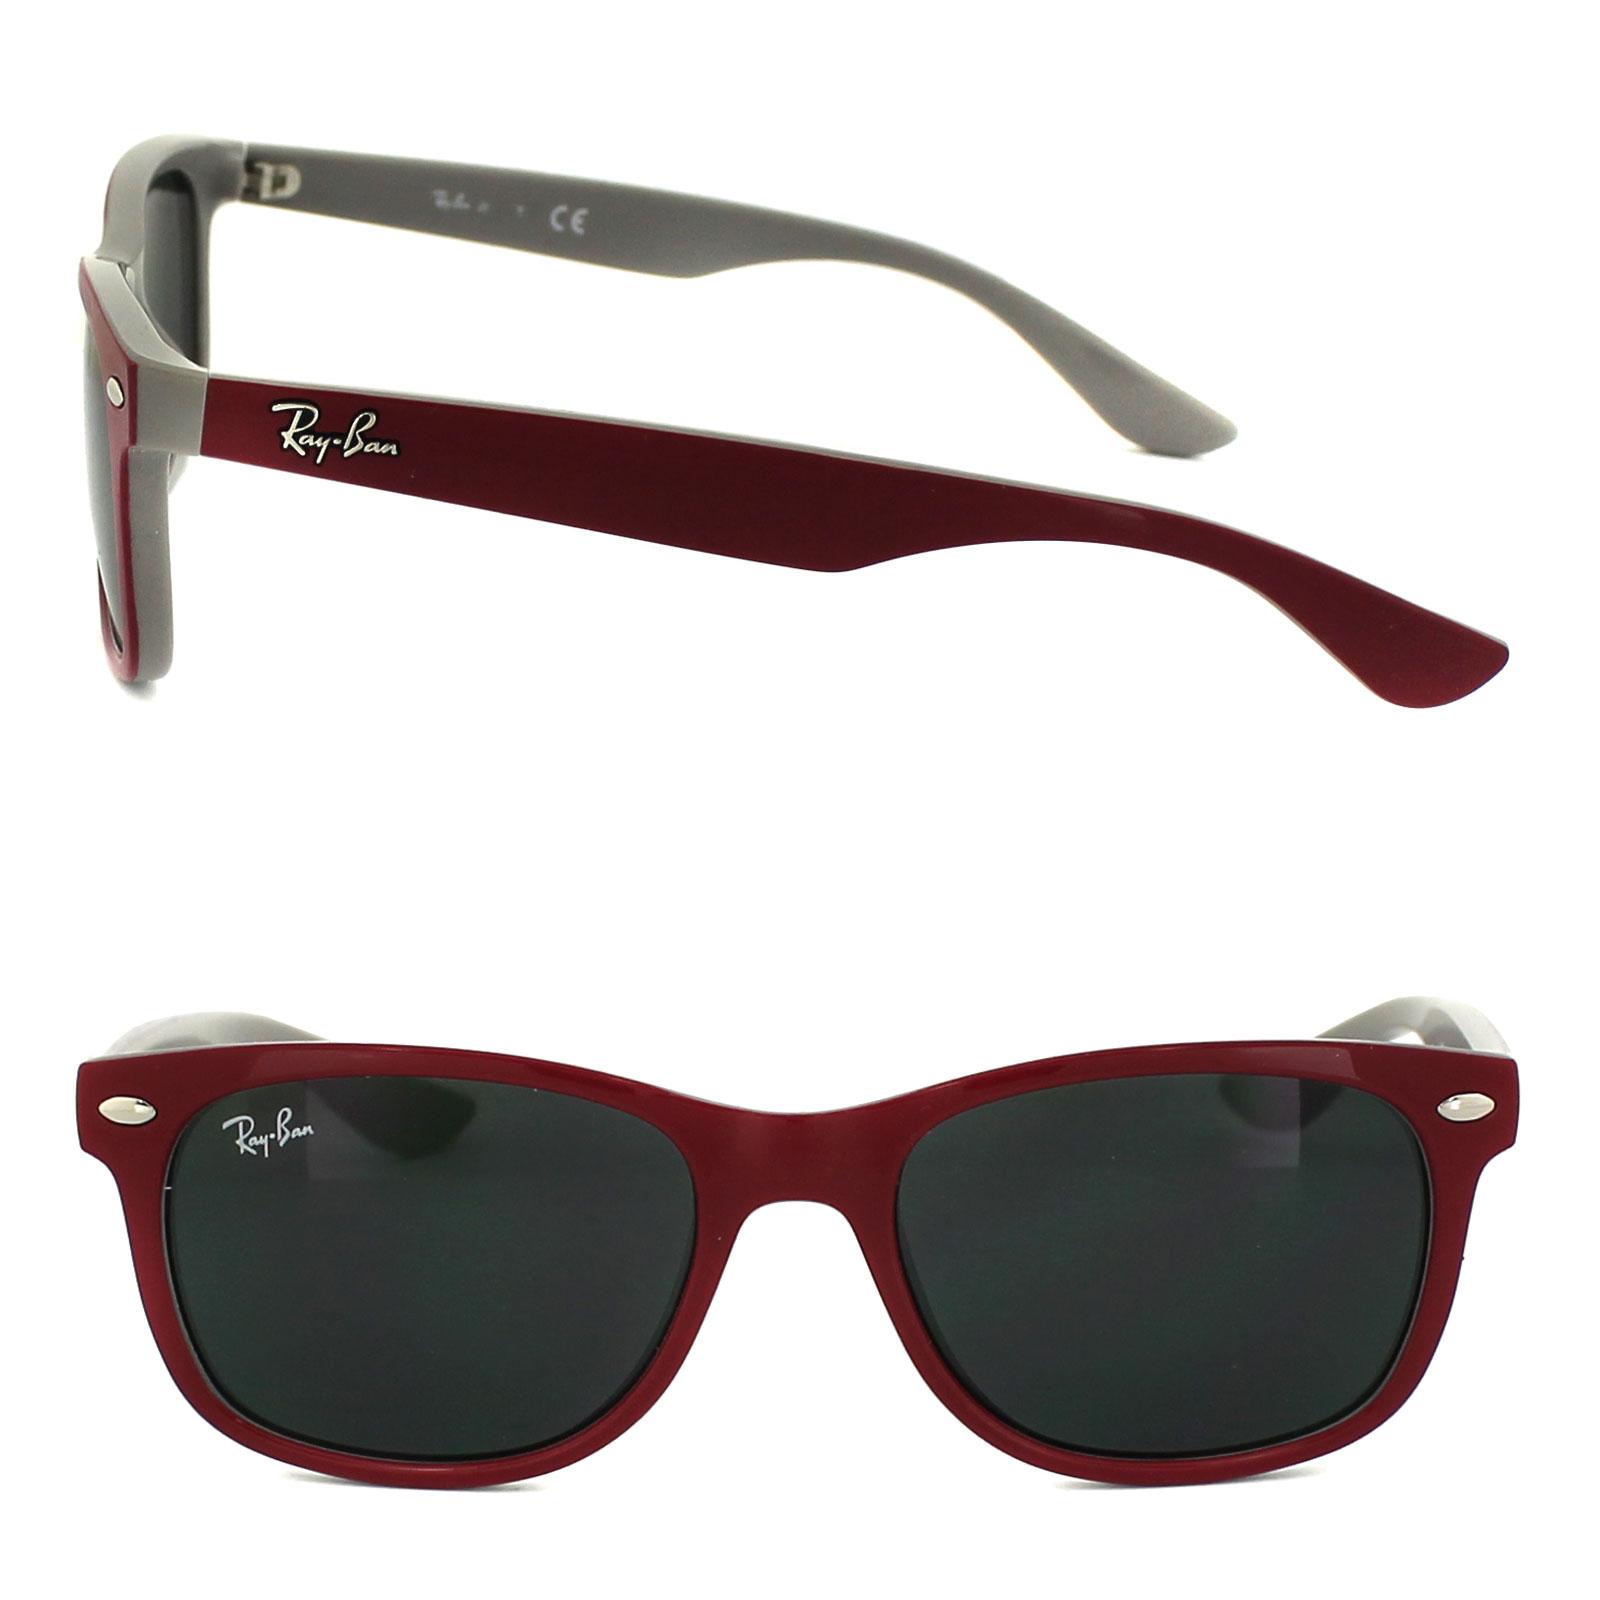 a12e7511f7 Ray Ban Sunglasses Junior Rb 9052s Ray Ban « Heritage Malta